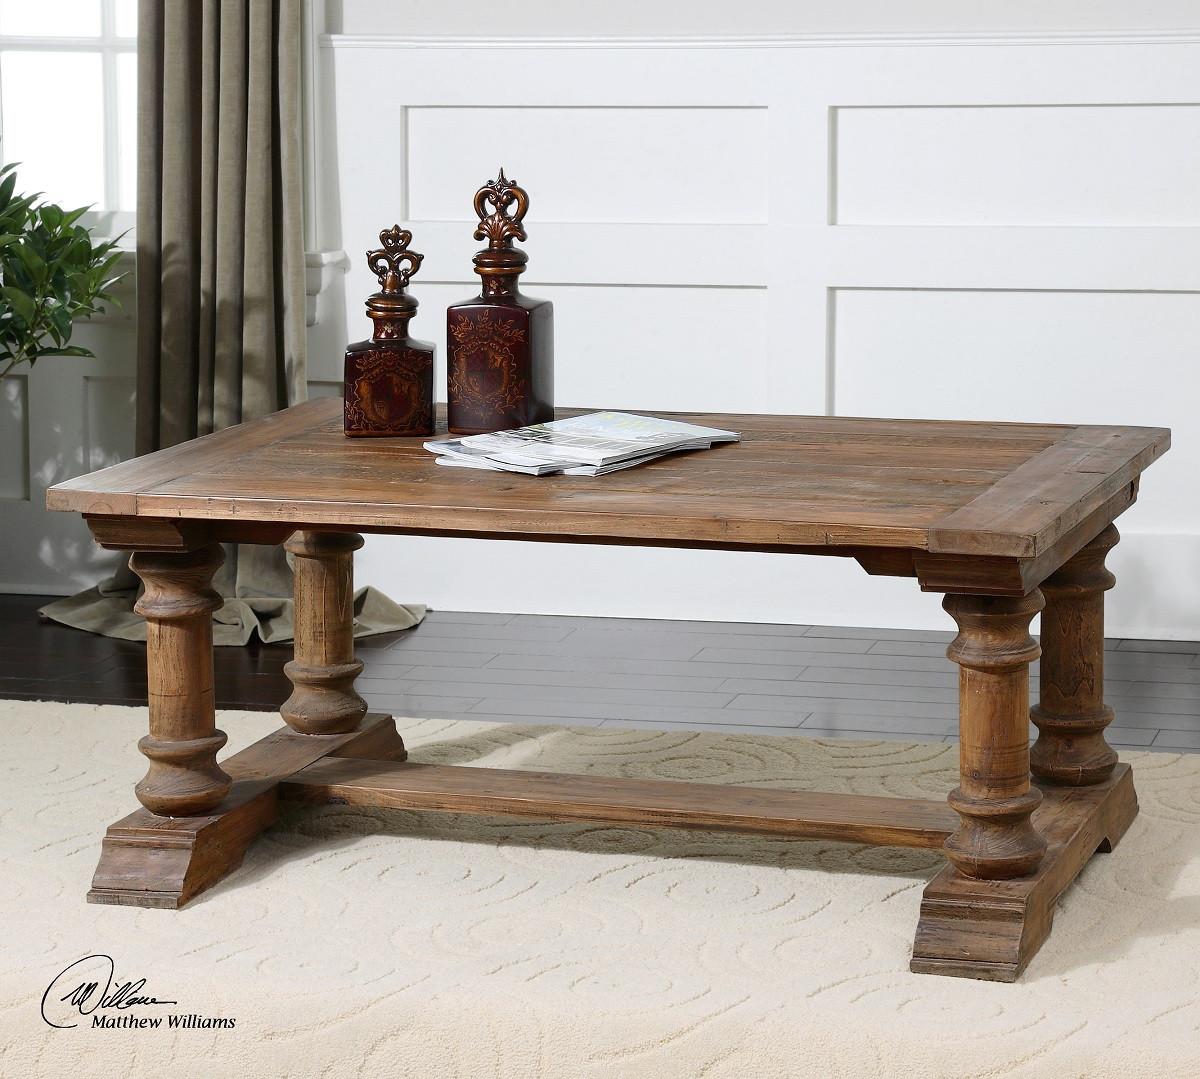 Saturia Balustrade Reclaimed Wood Coffee Table